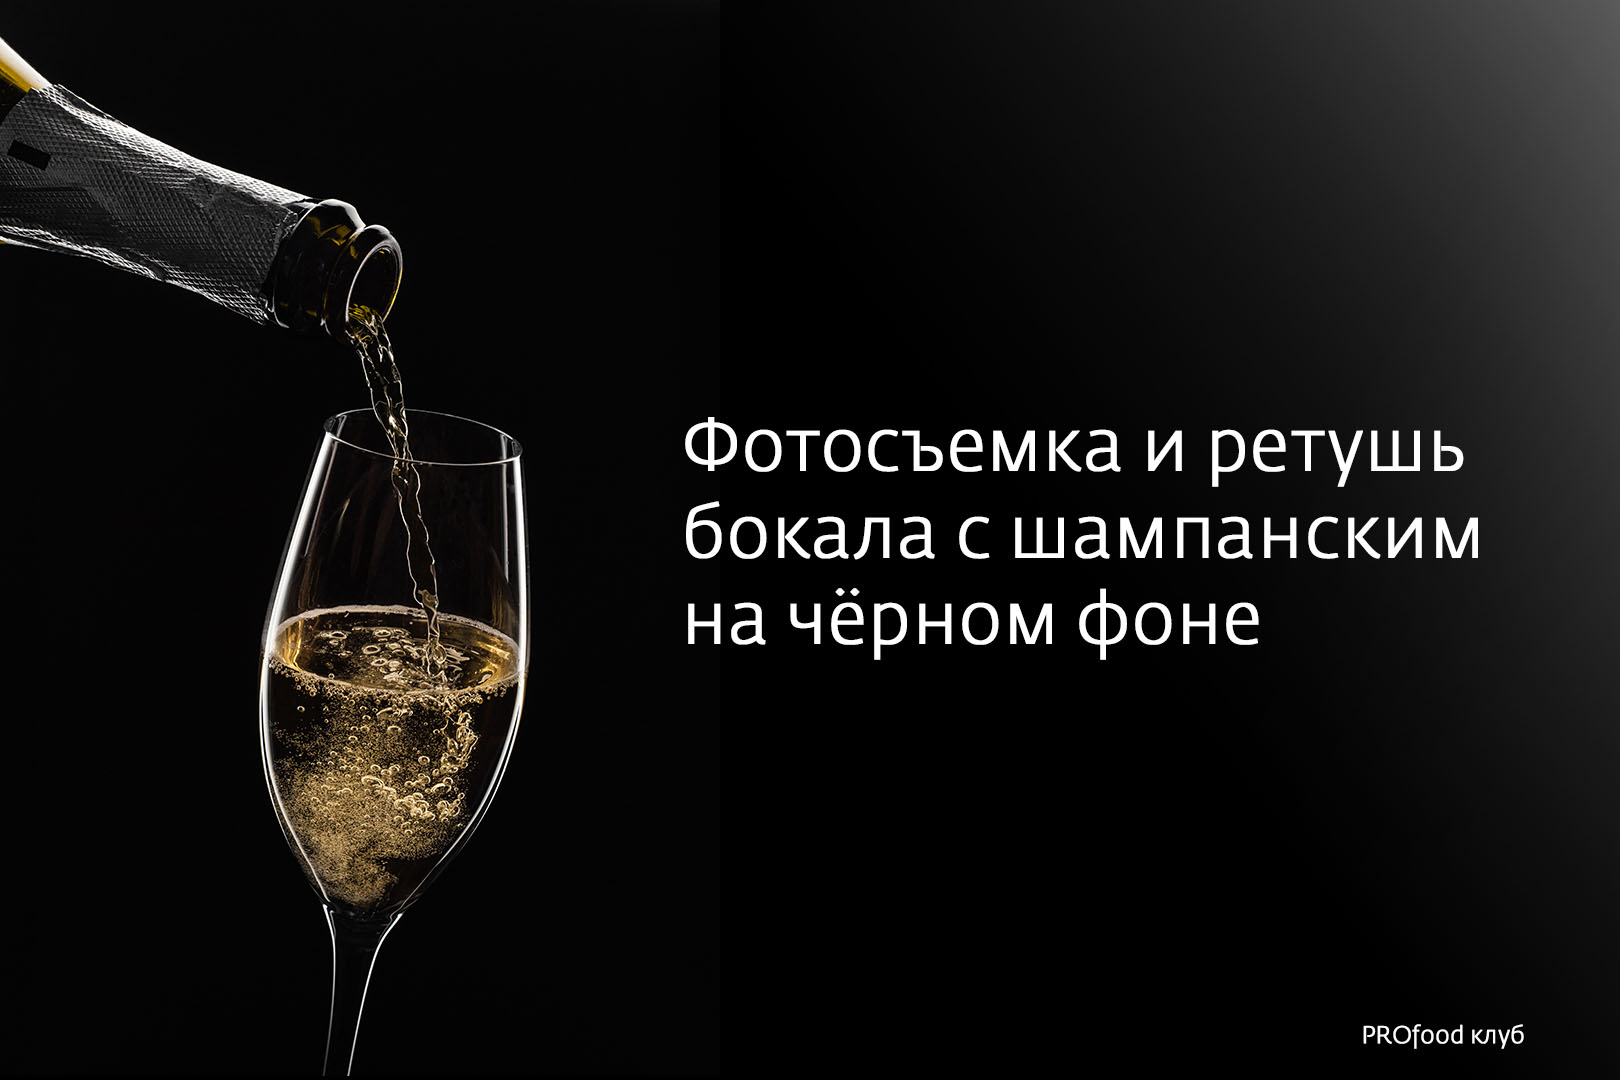 Бокал с шампанским на черном фоне